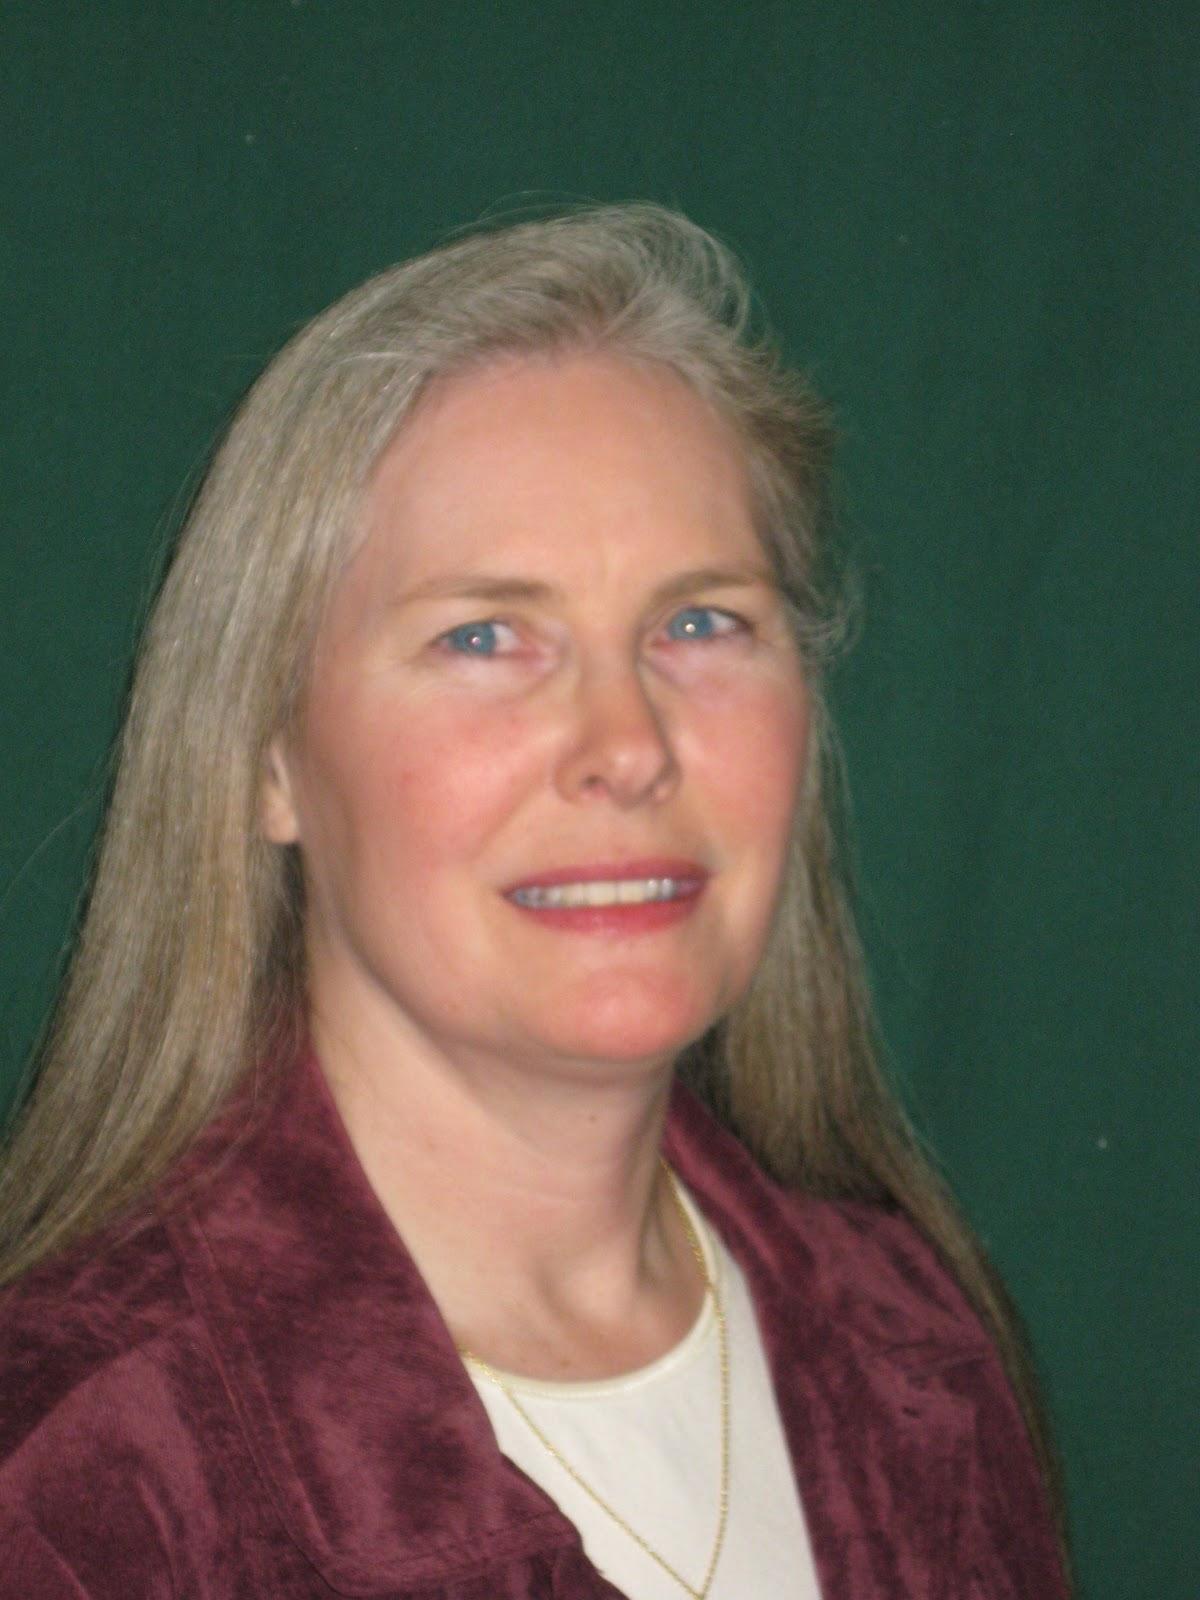 Susan Pizarek head shot